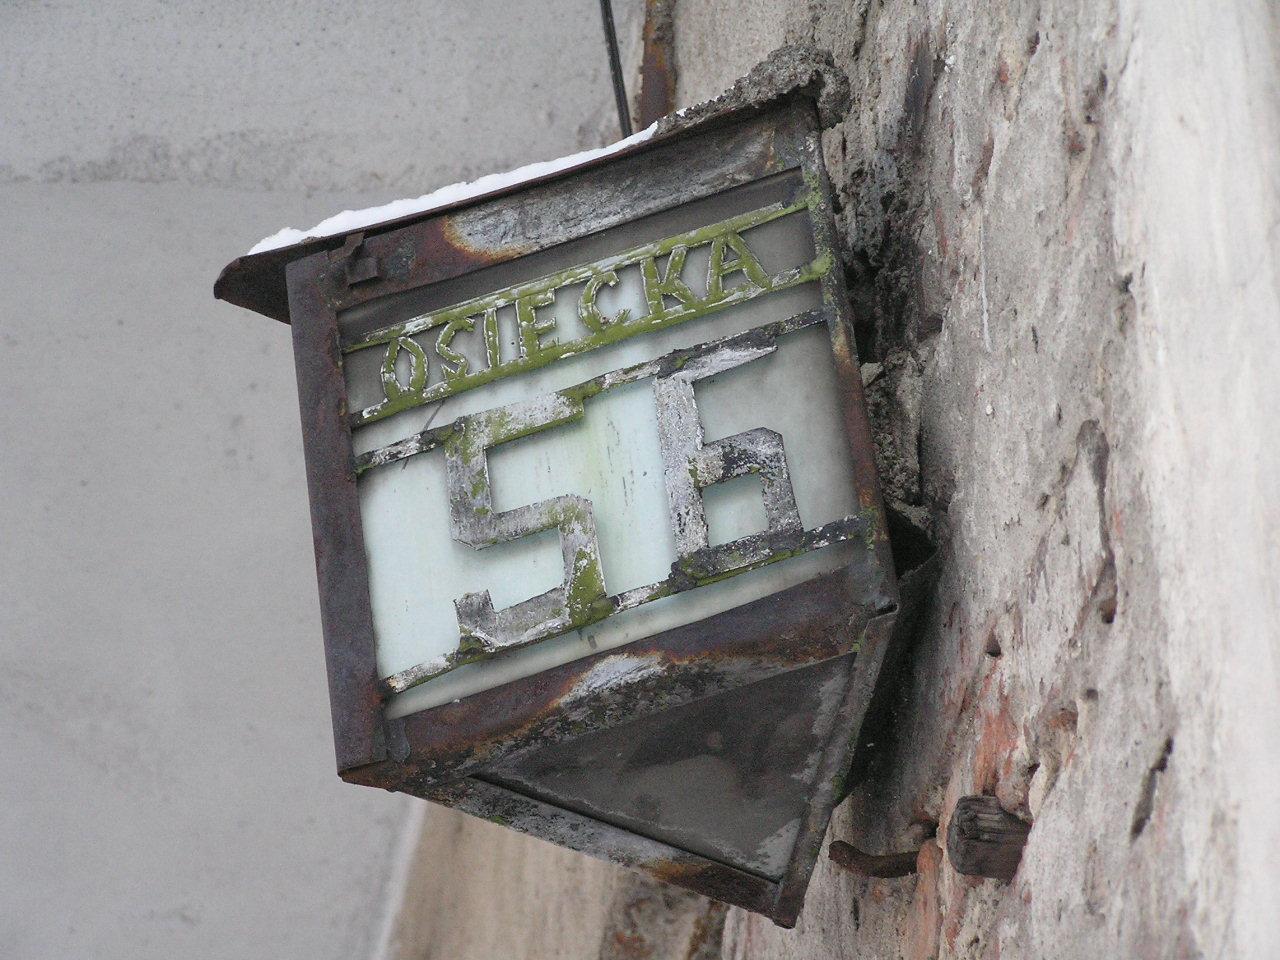 Latarenka adresowa - Osiecka 56